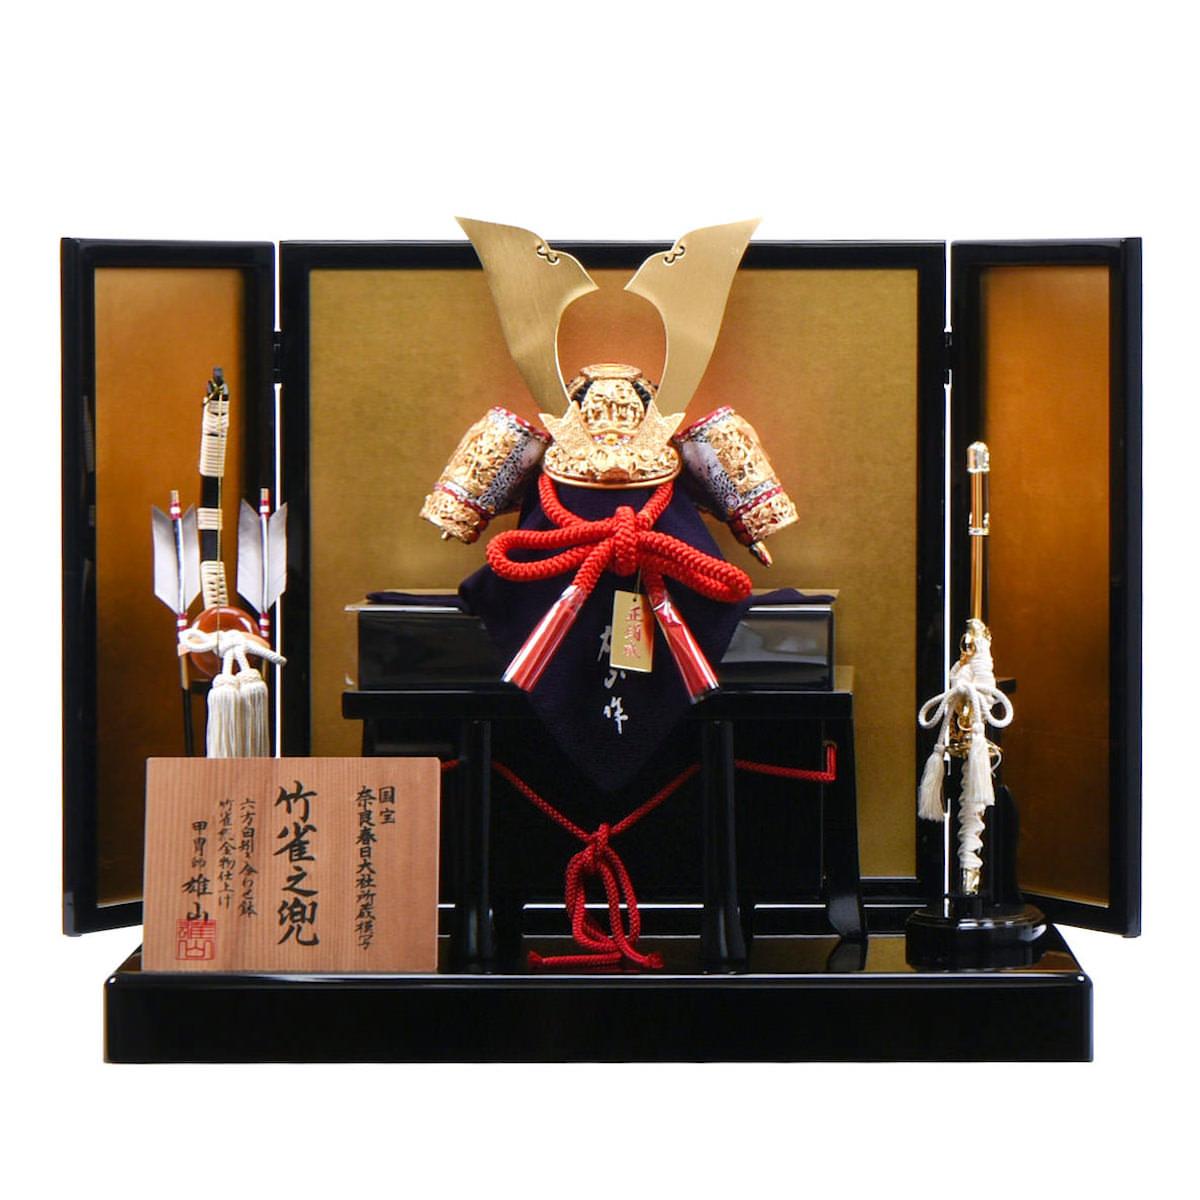 五月節句 男の子 五月人形 兜飾り 10号 竹に虎雀兜飾り 鈴甲子雄山作 送料無料